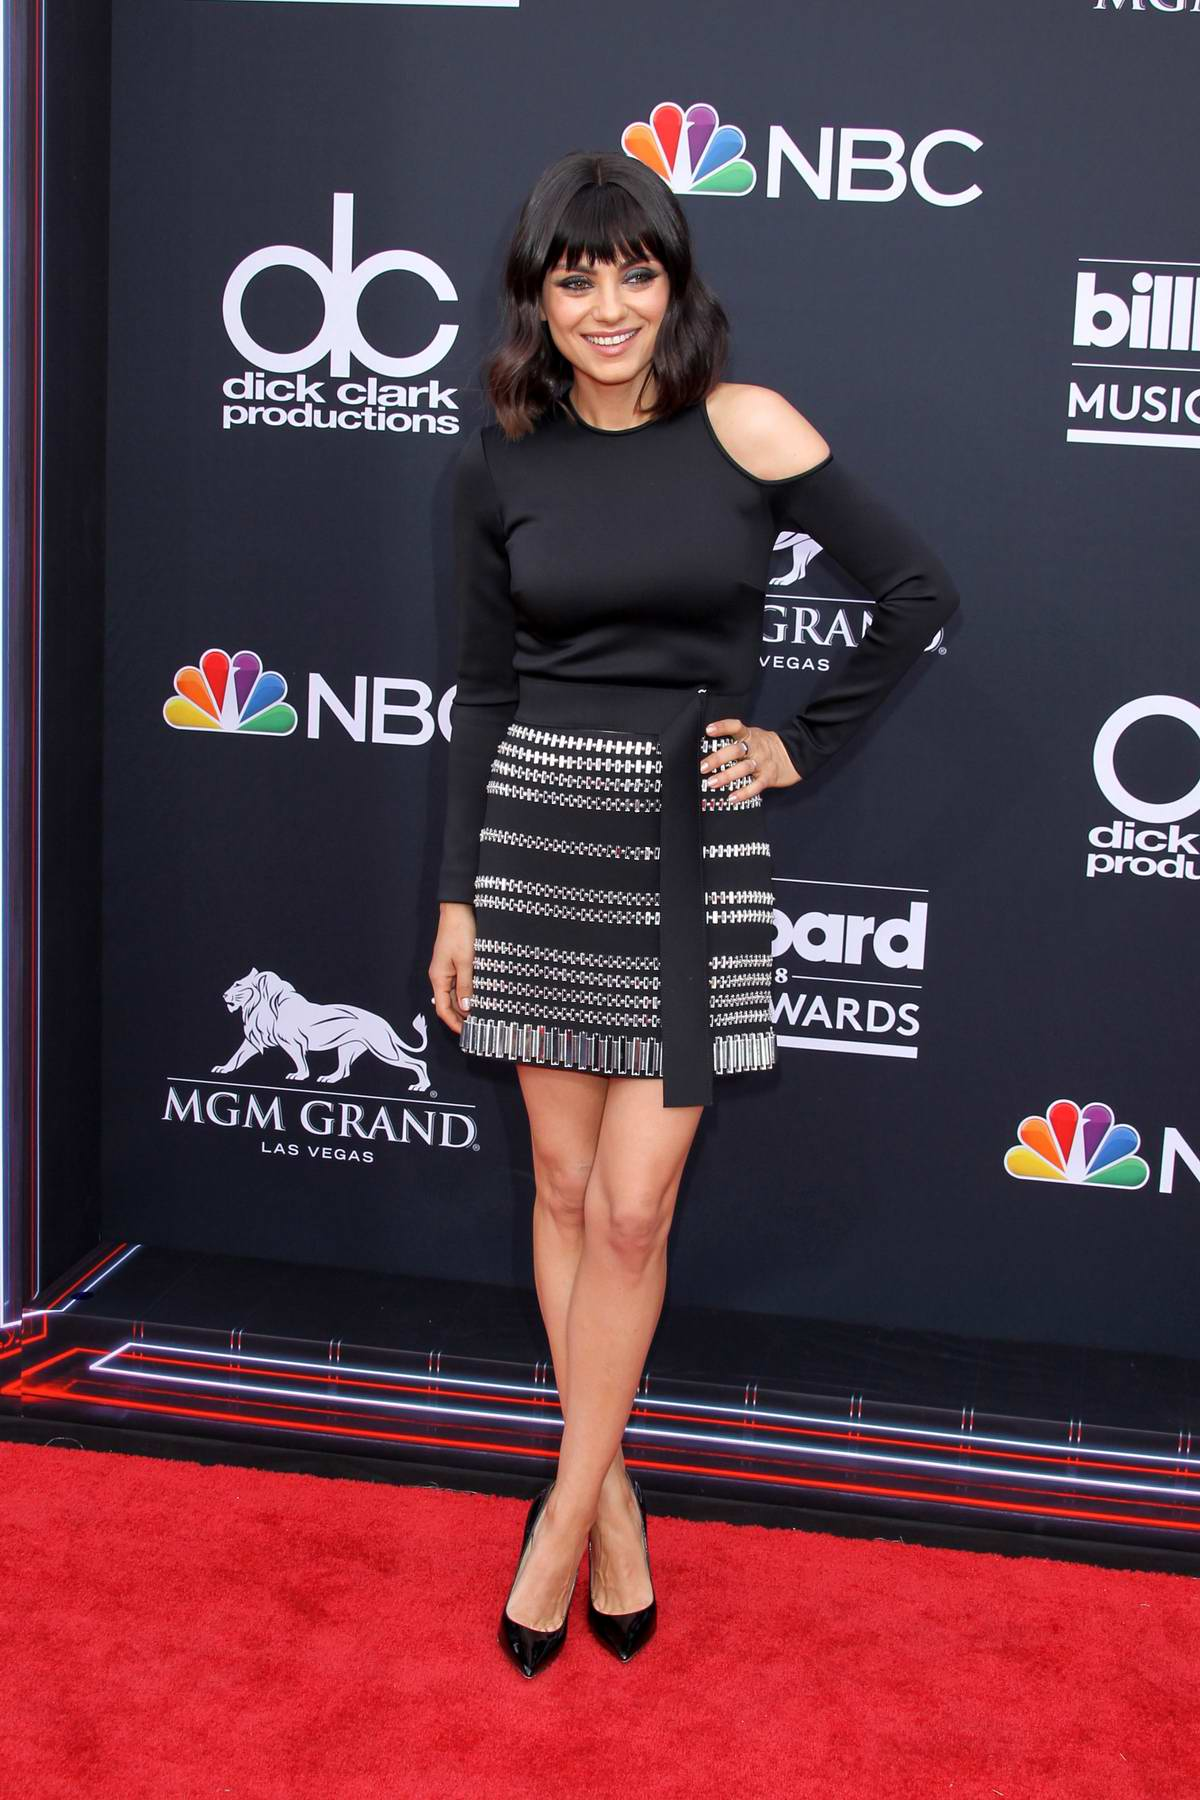 Mila Kunis attends the 2018 Billboard Music Awards at MGM Grand Garden in Las Vegas, Nevada